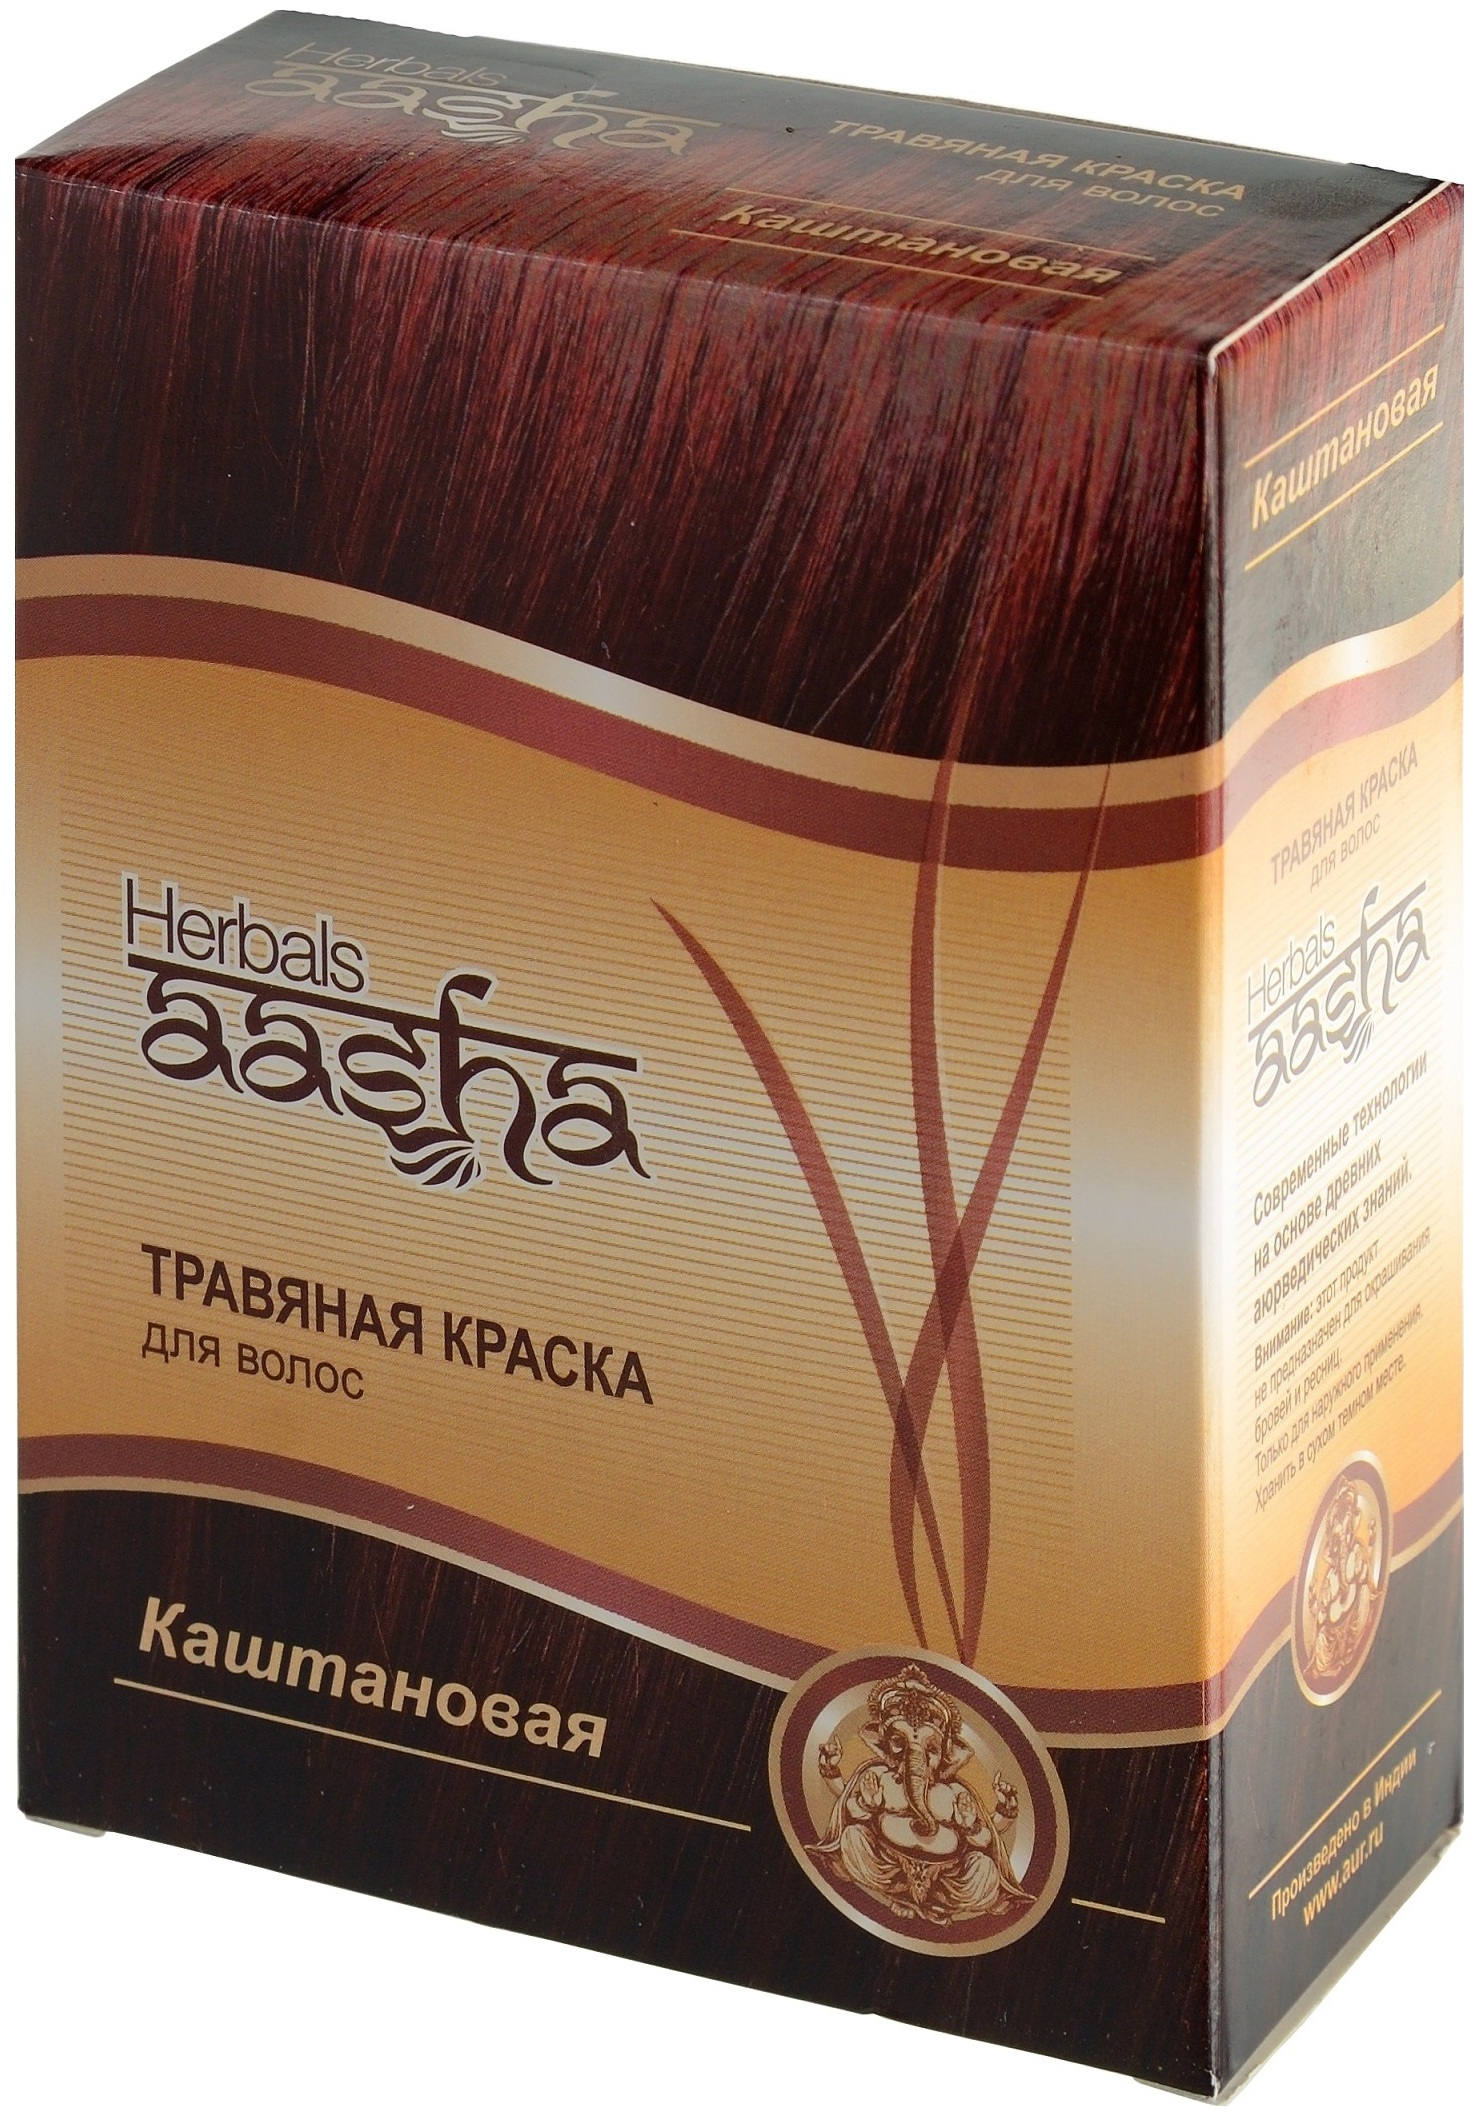 Краска для волос Aasha Травяная Каштановый